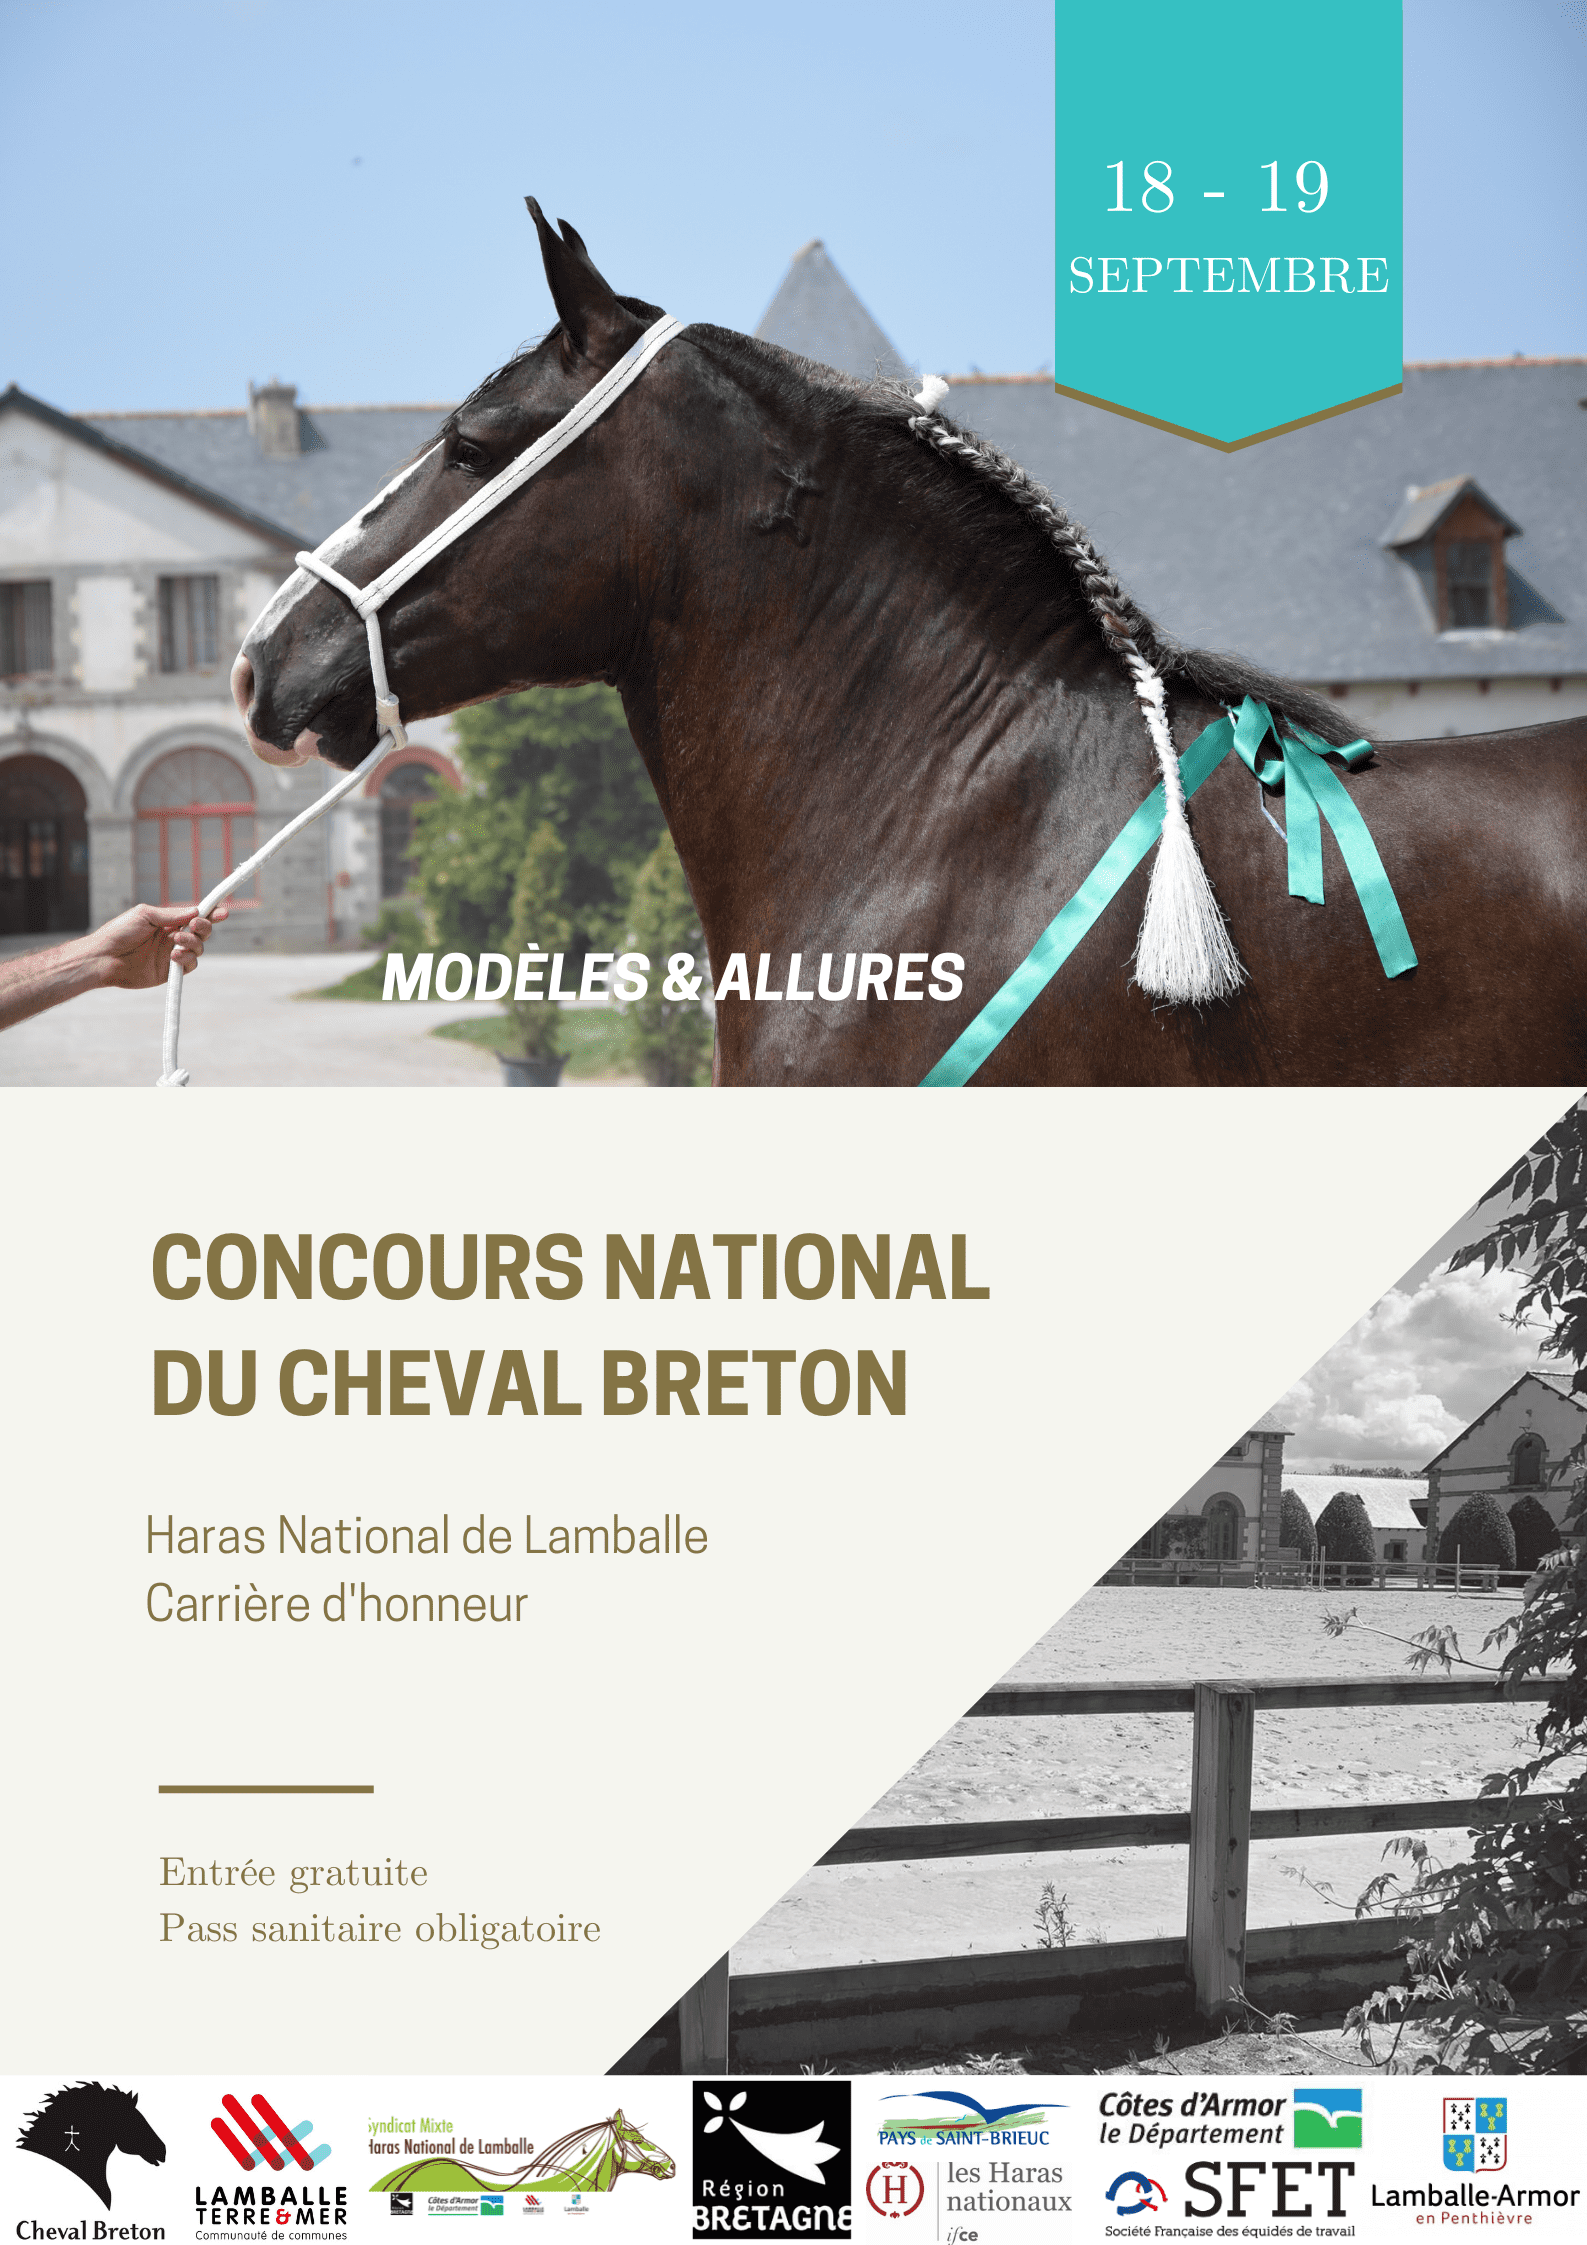 Concours national du Cheval Breton